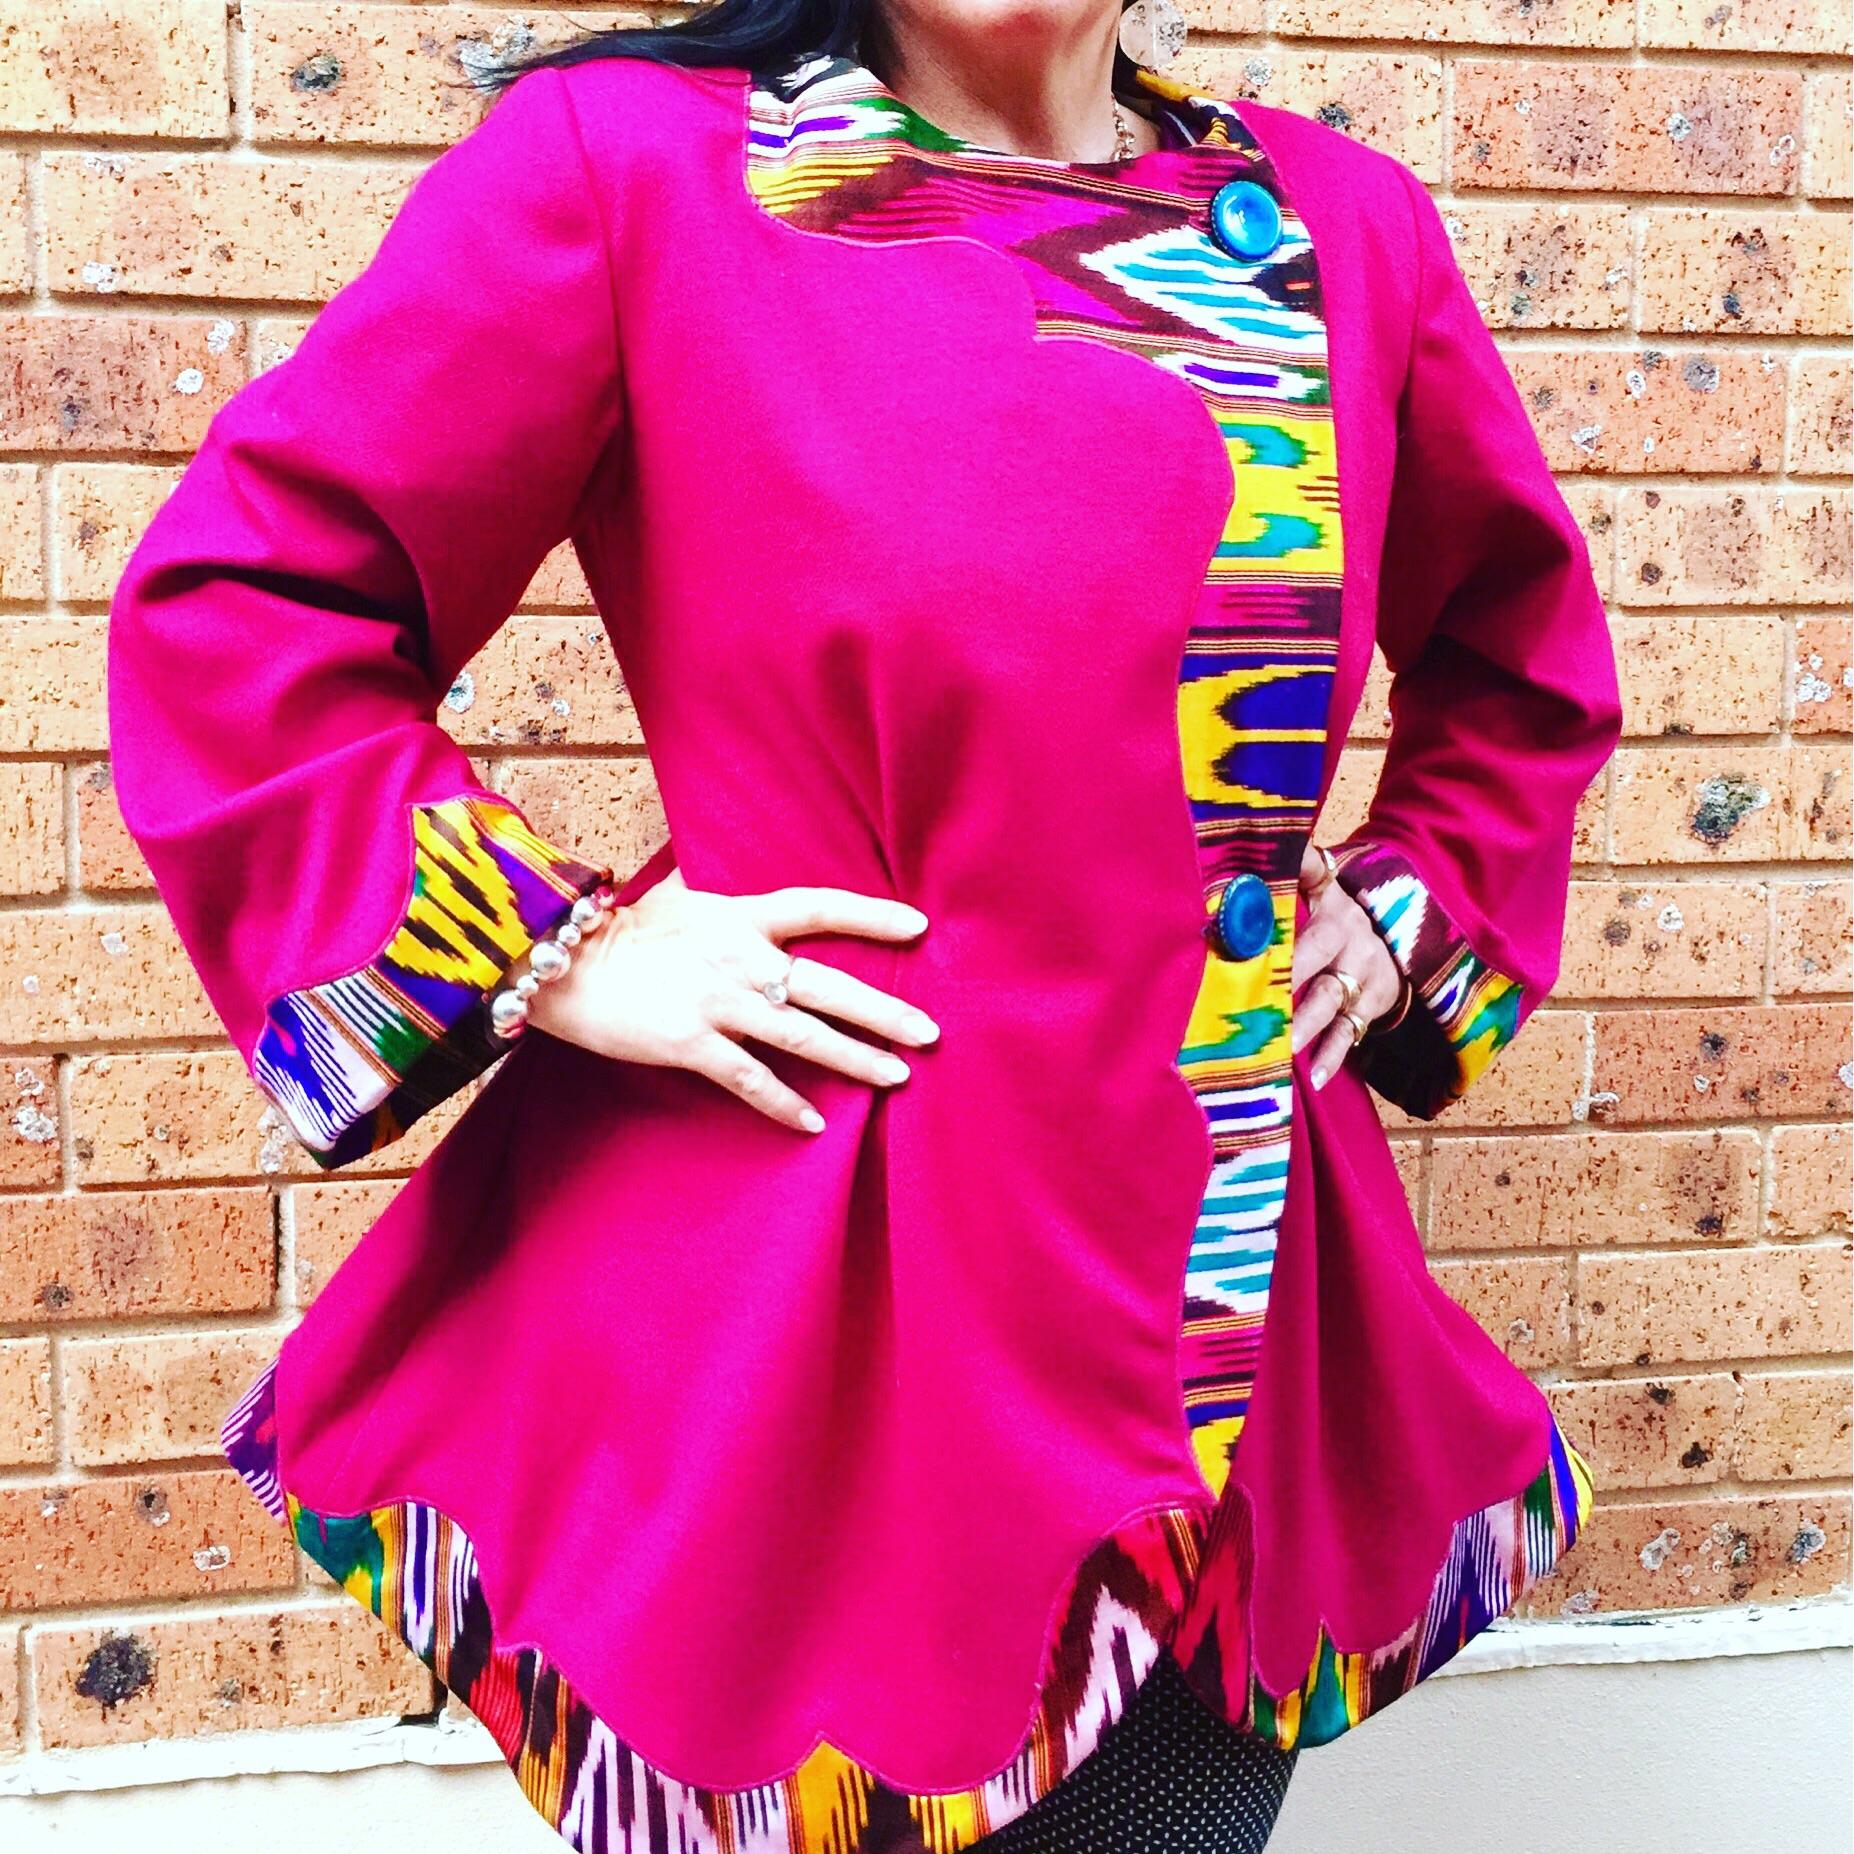 Katrina's Bright Pink Coat with Uzbekistani silk ikat appliqué detailing and bell sleeves.